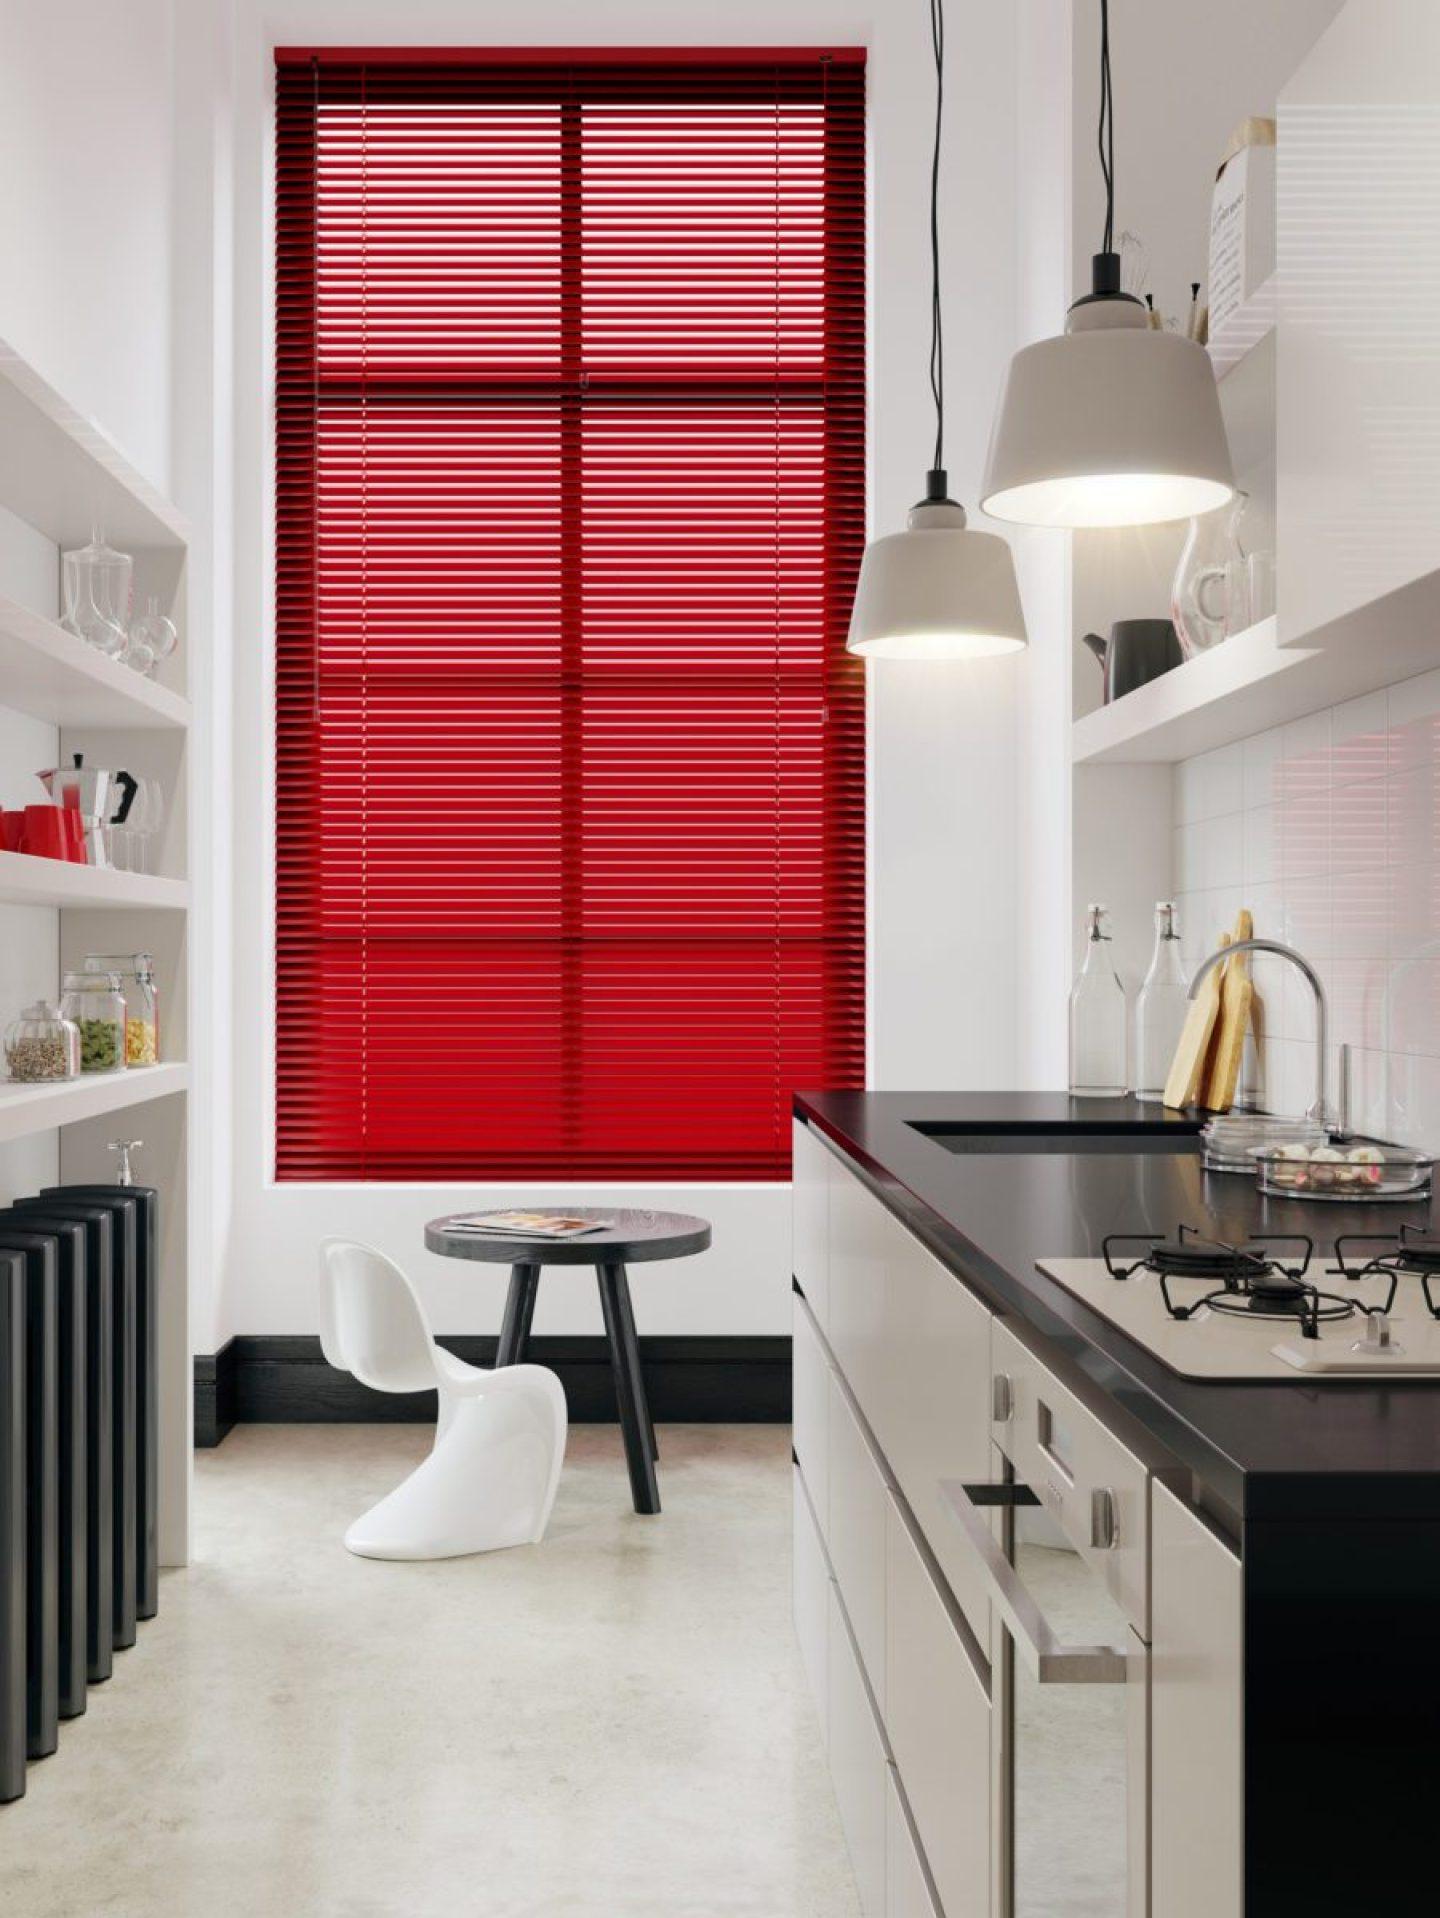 Kitchen-Venetian-Blinds.-Luxurious-Red-Aluminium-Blinds.-1-1440x1918 DST Home Decor Inspiration: Crimson and Cream Design Style